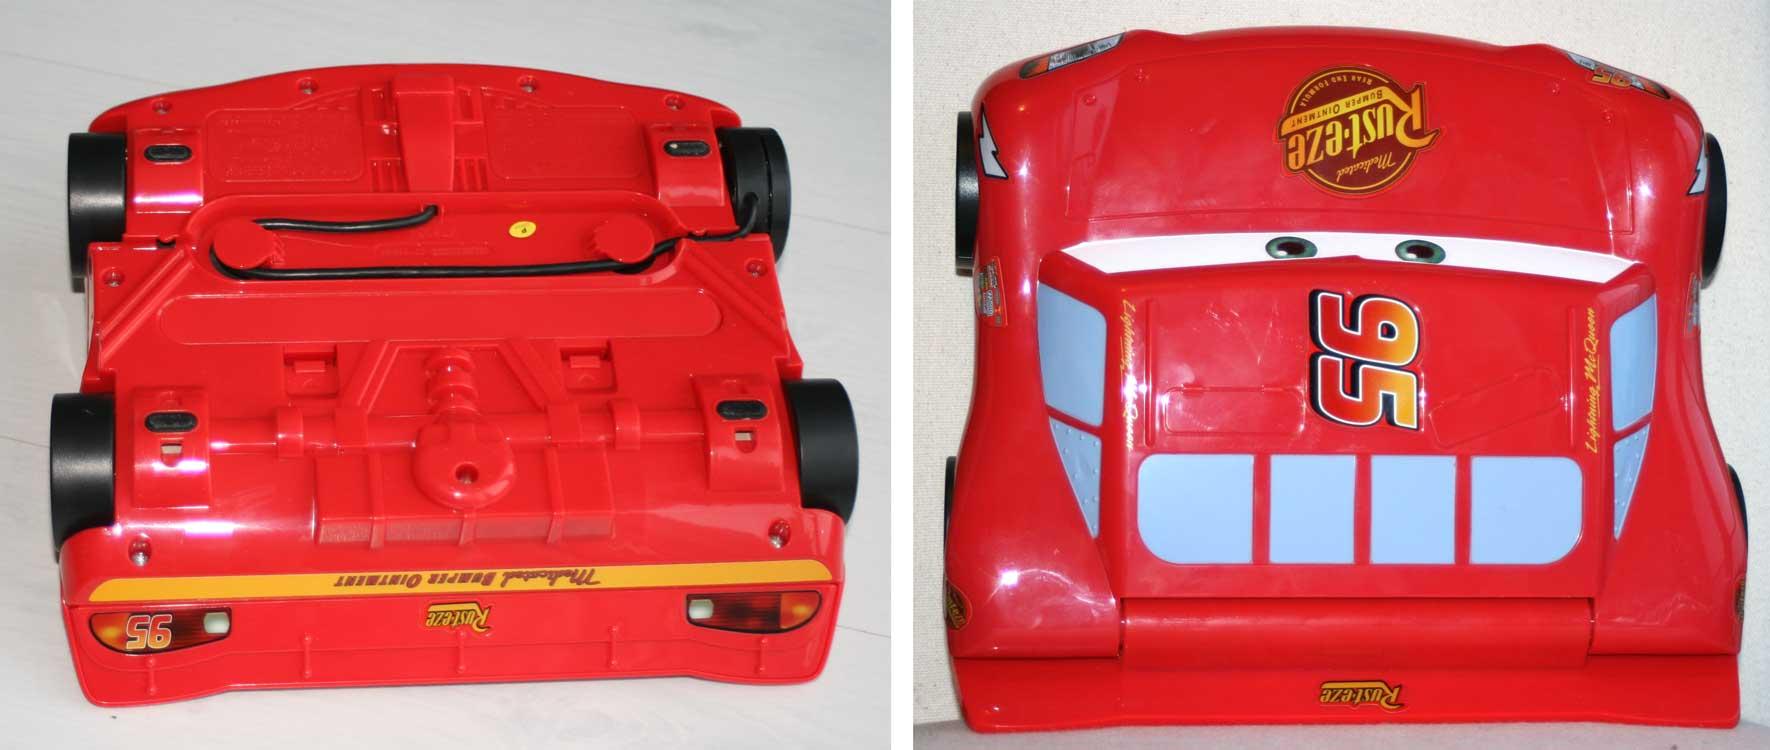 vue de dessus et dessous - Genius Flash McQueen (2008) Ordinateur Cars